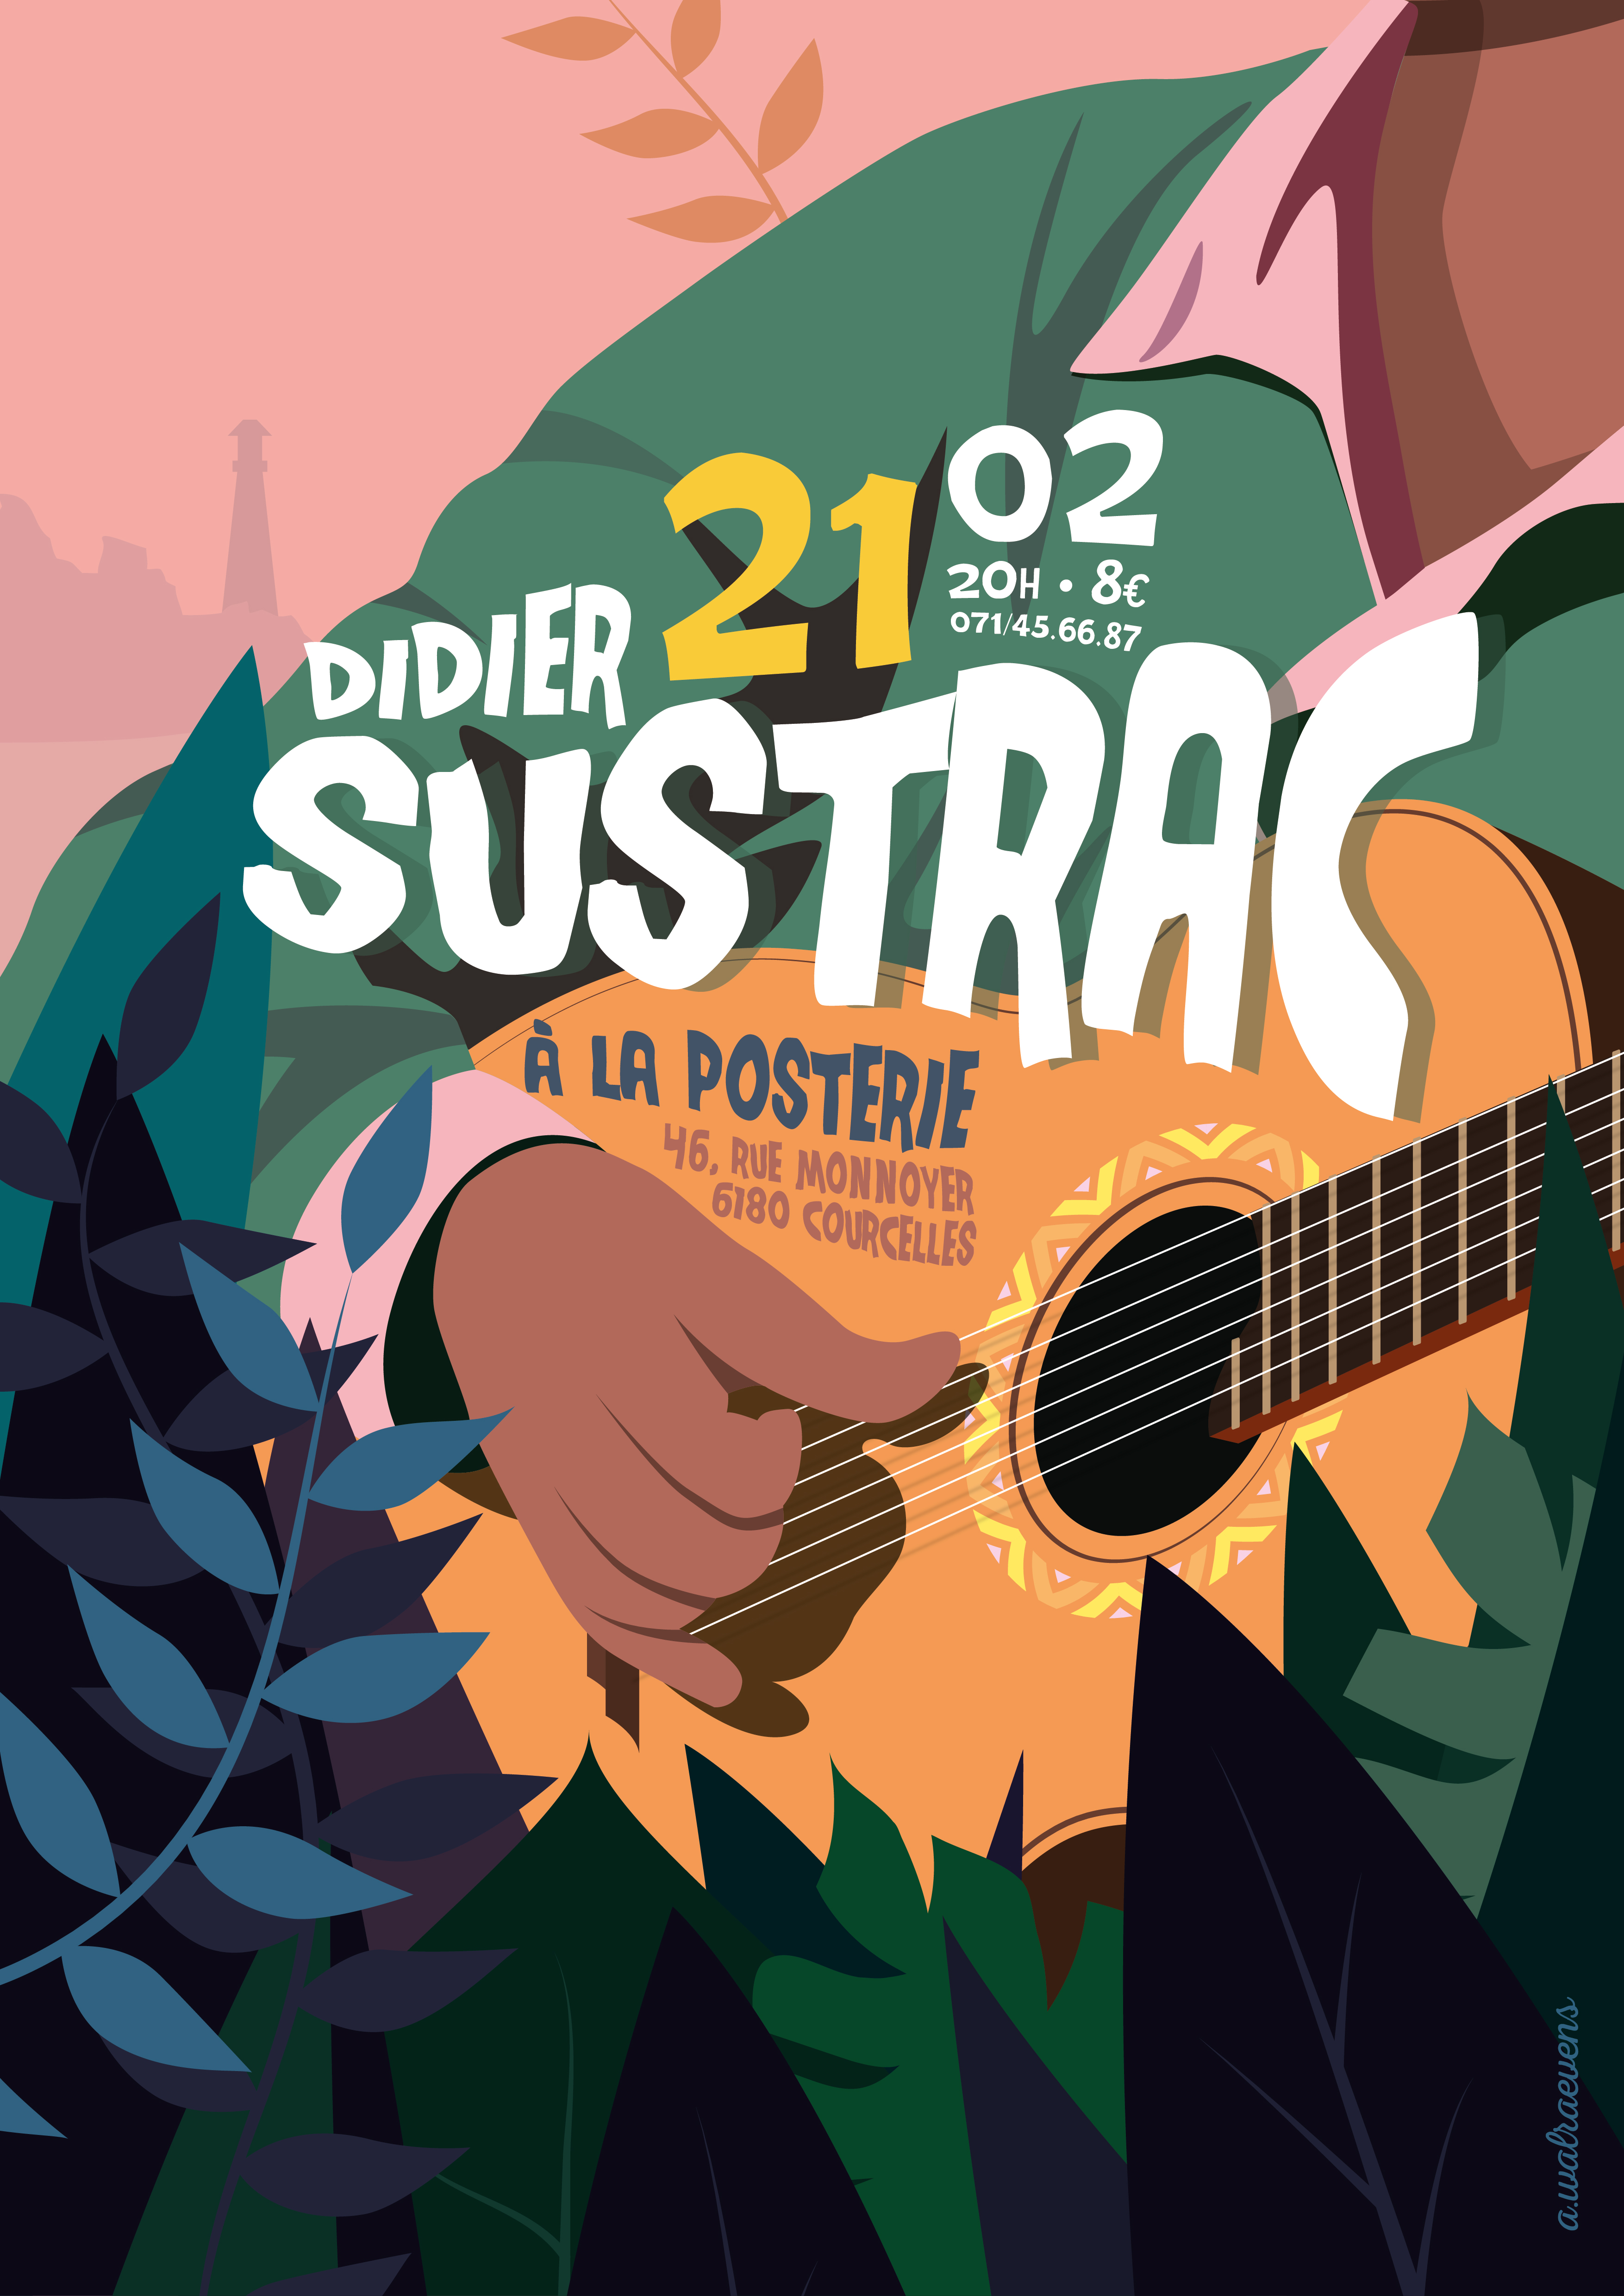 Didier Sustrac - Bossa Nova